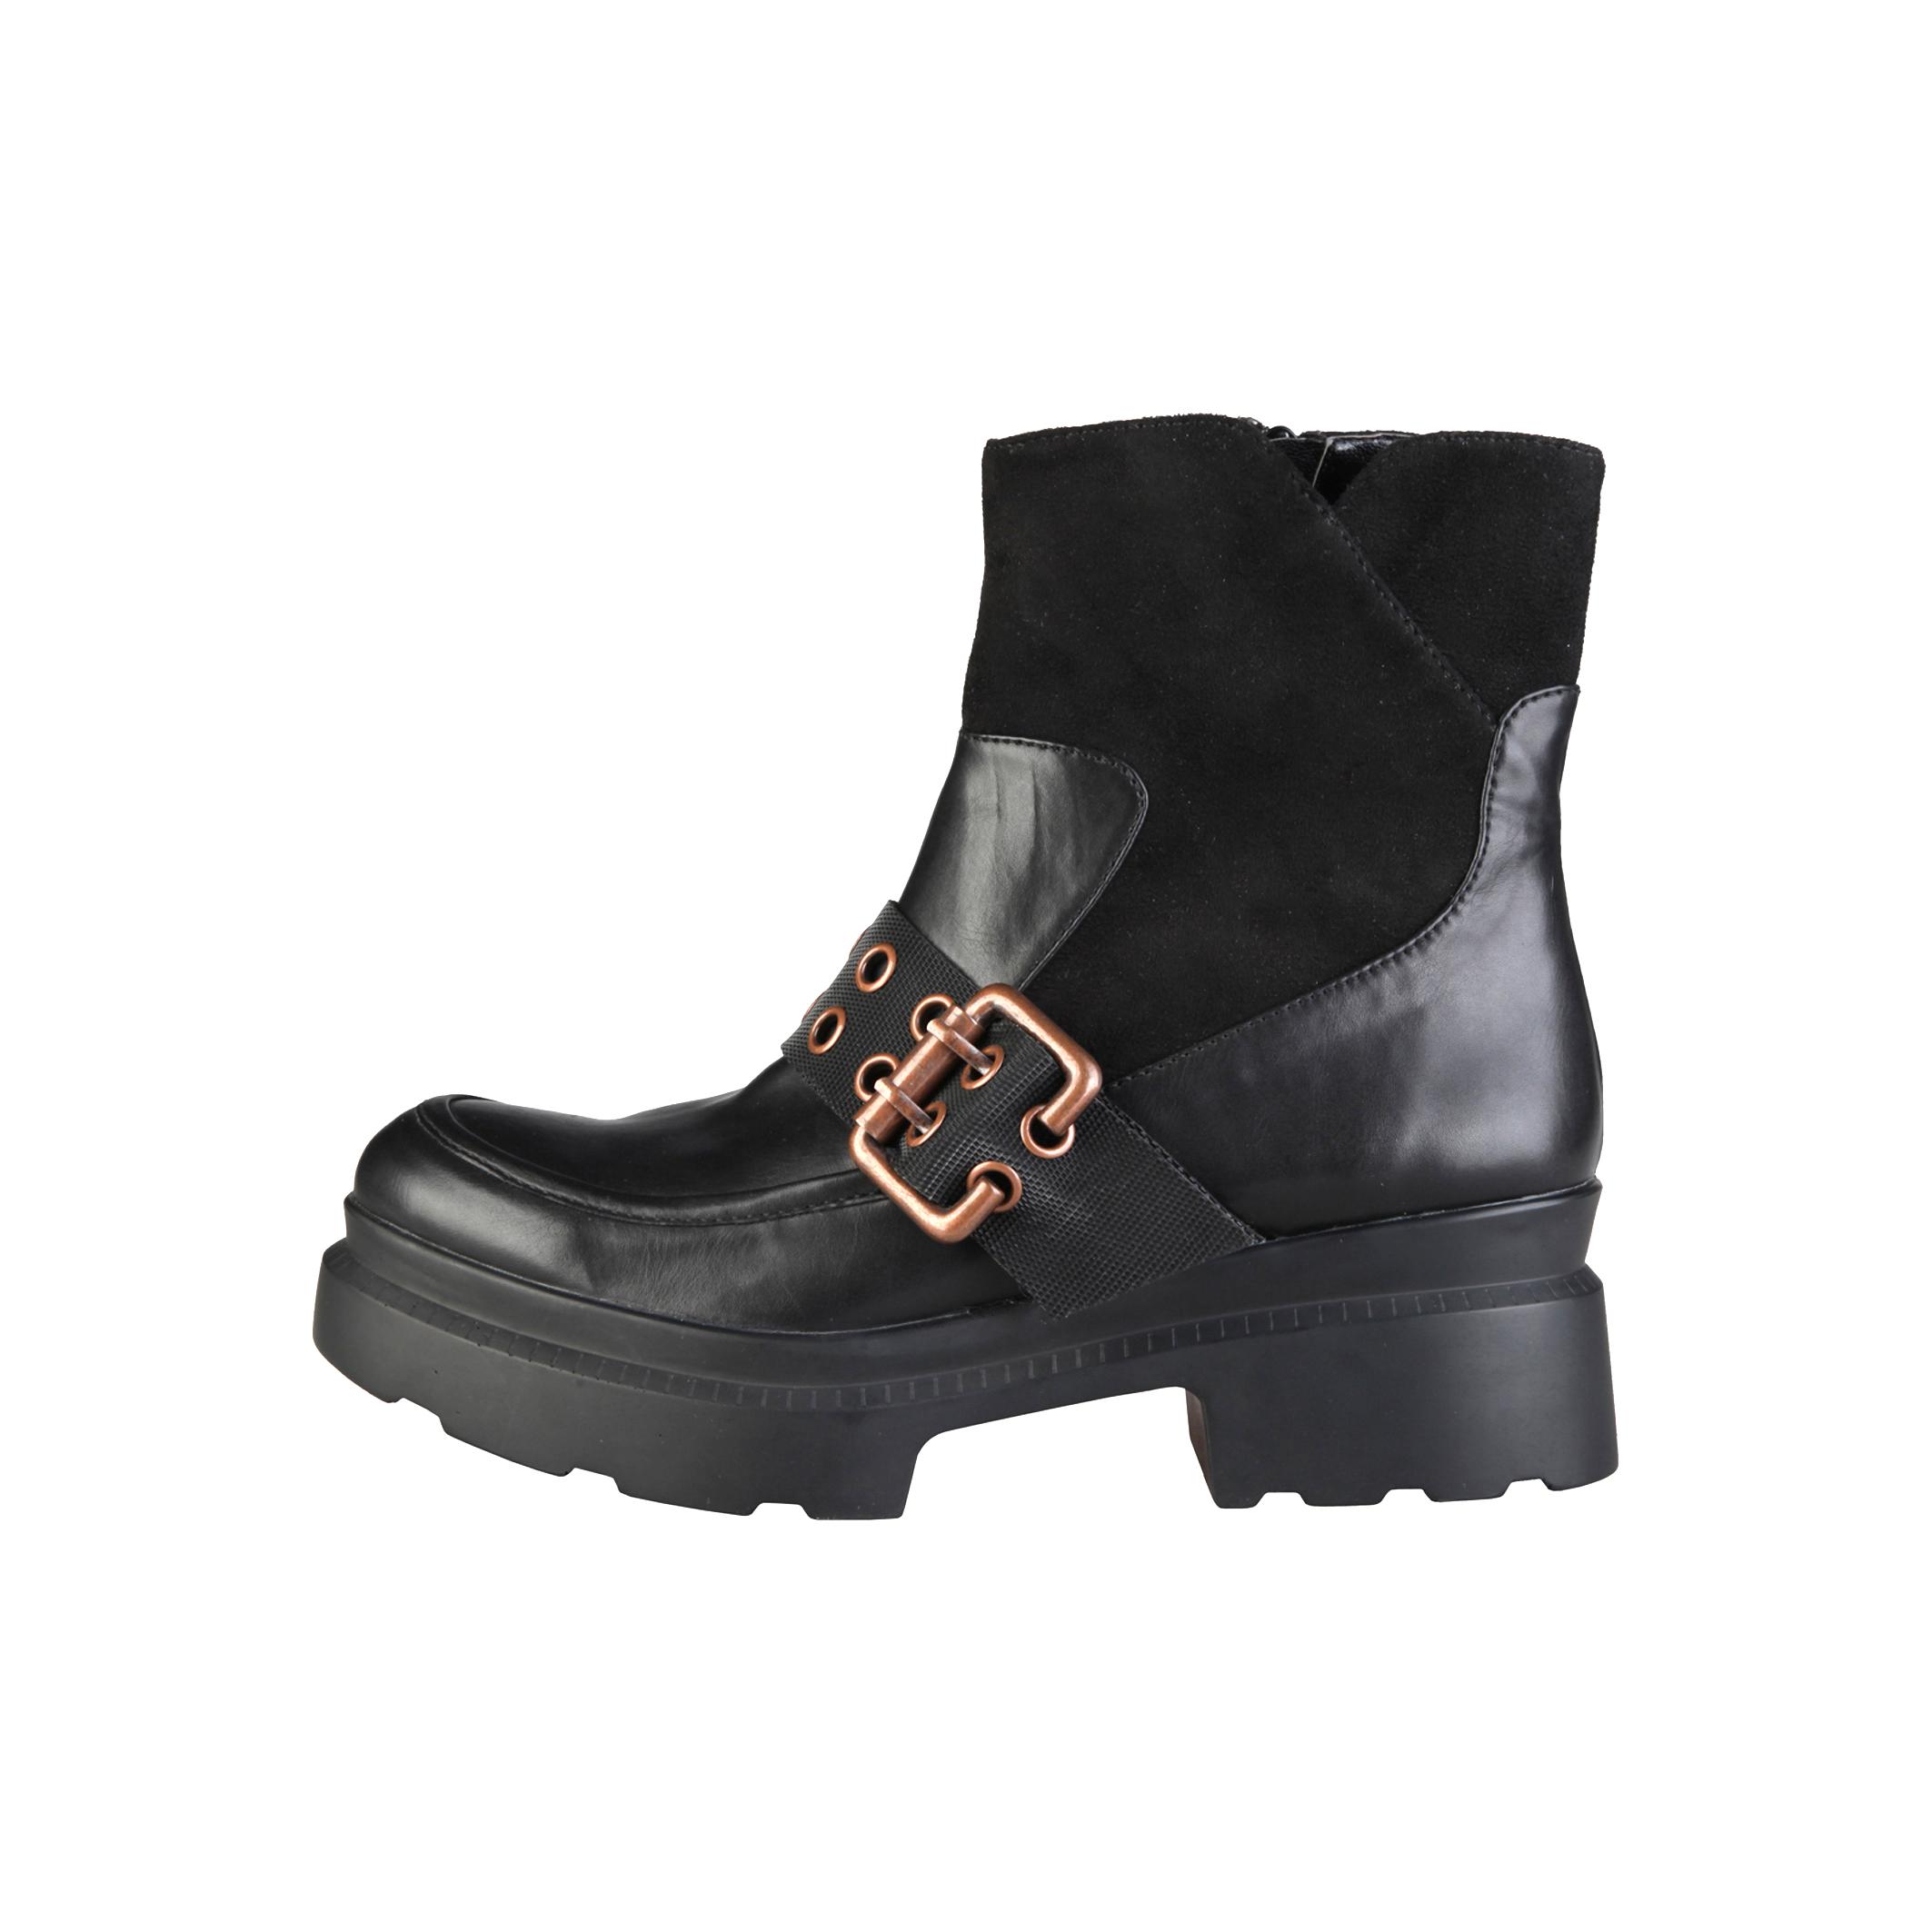 Chaussures  Ana Lublin KARIN black